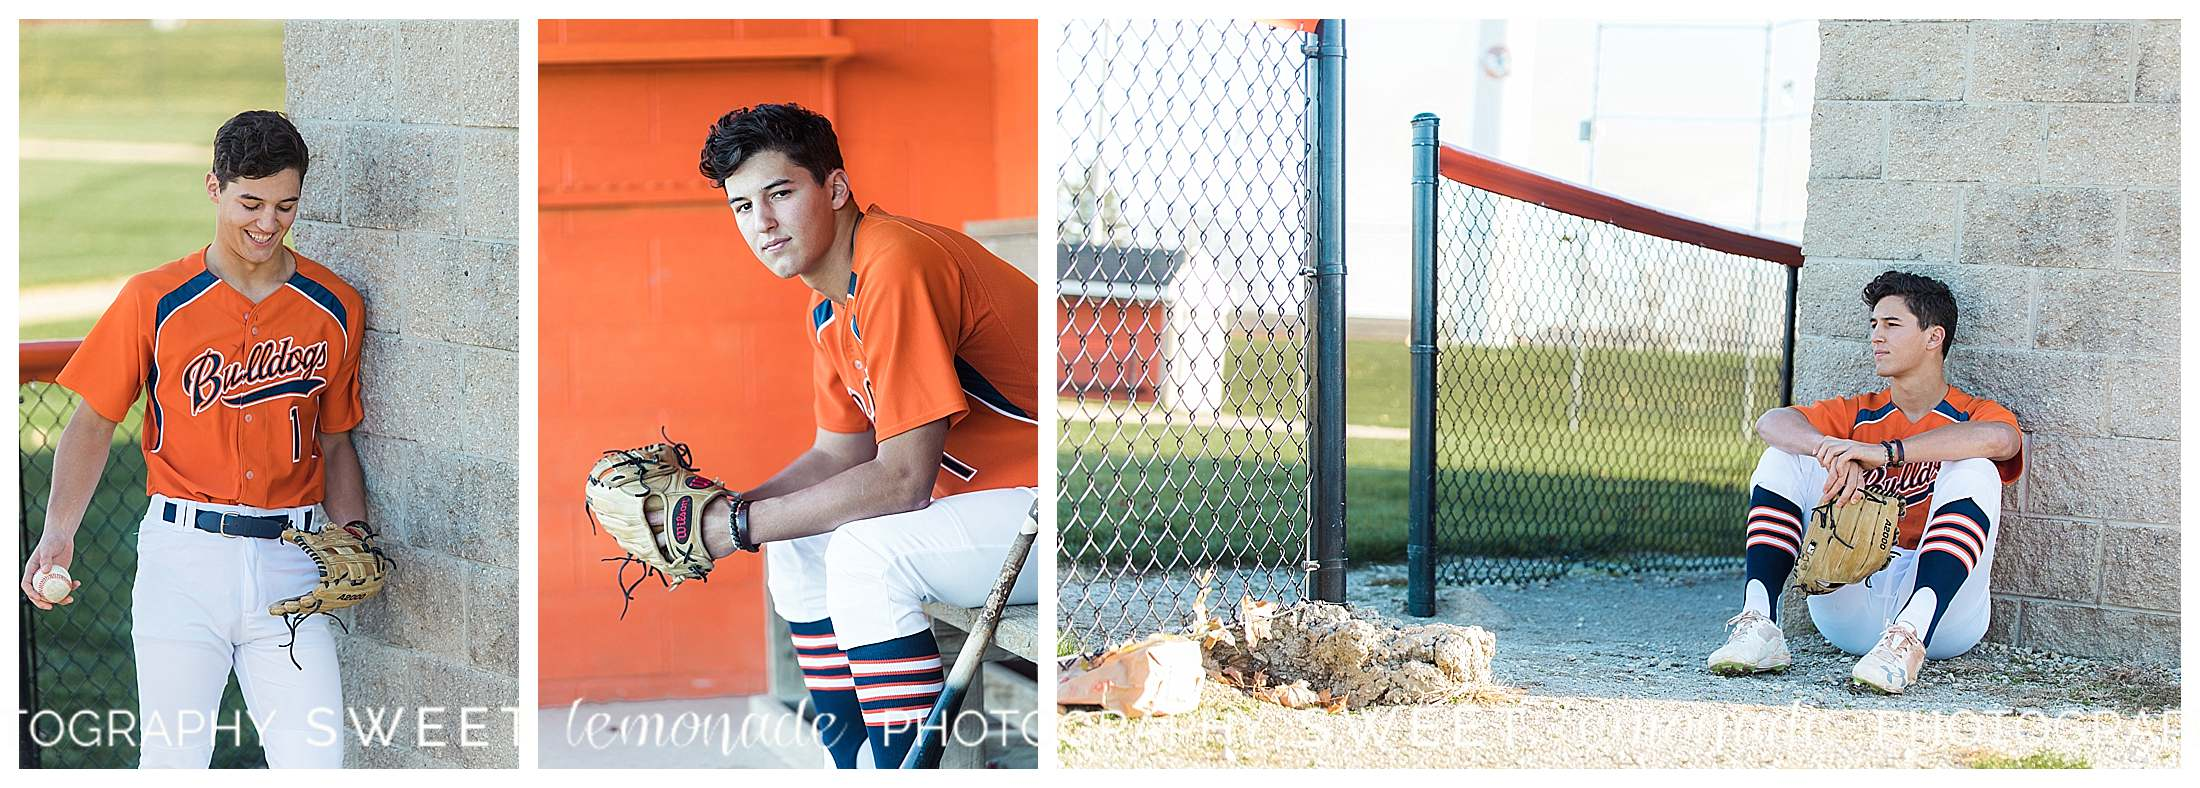 champaign-mahomet-illinois-senior-photographer-notre-dame-baseball-sweet-lemonade-photography_1778.jpg